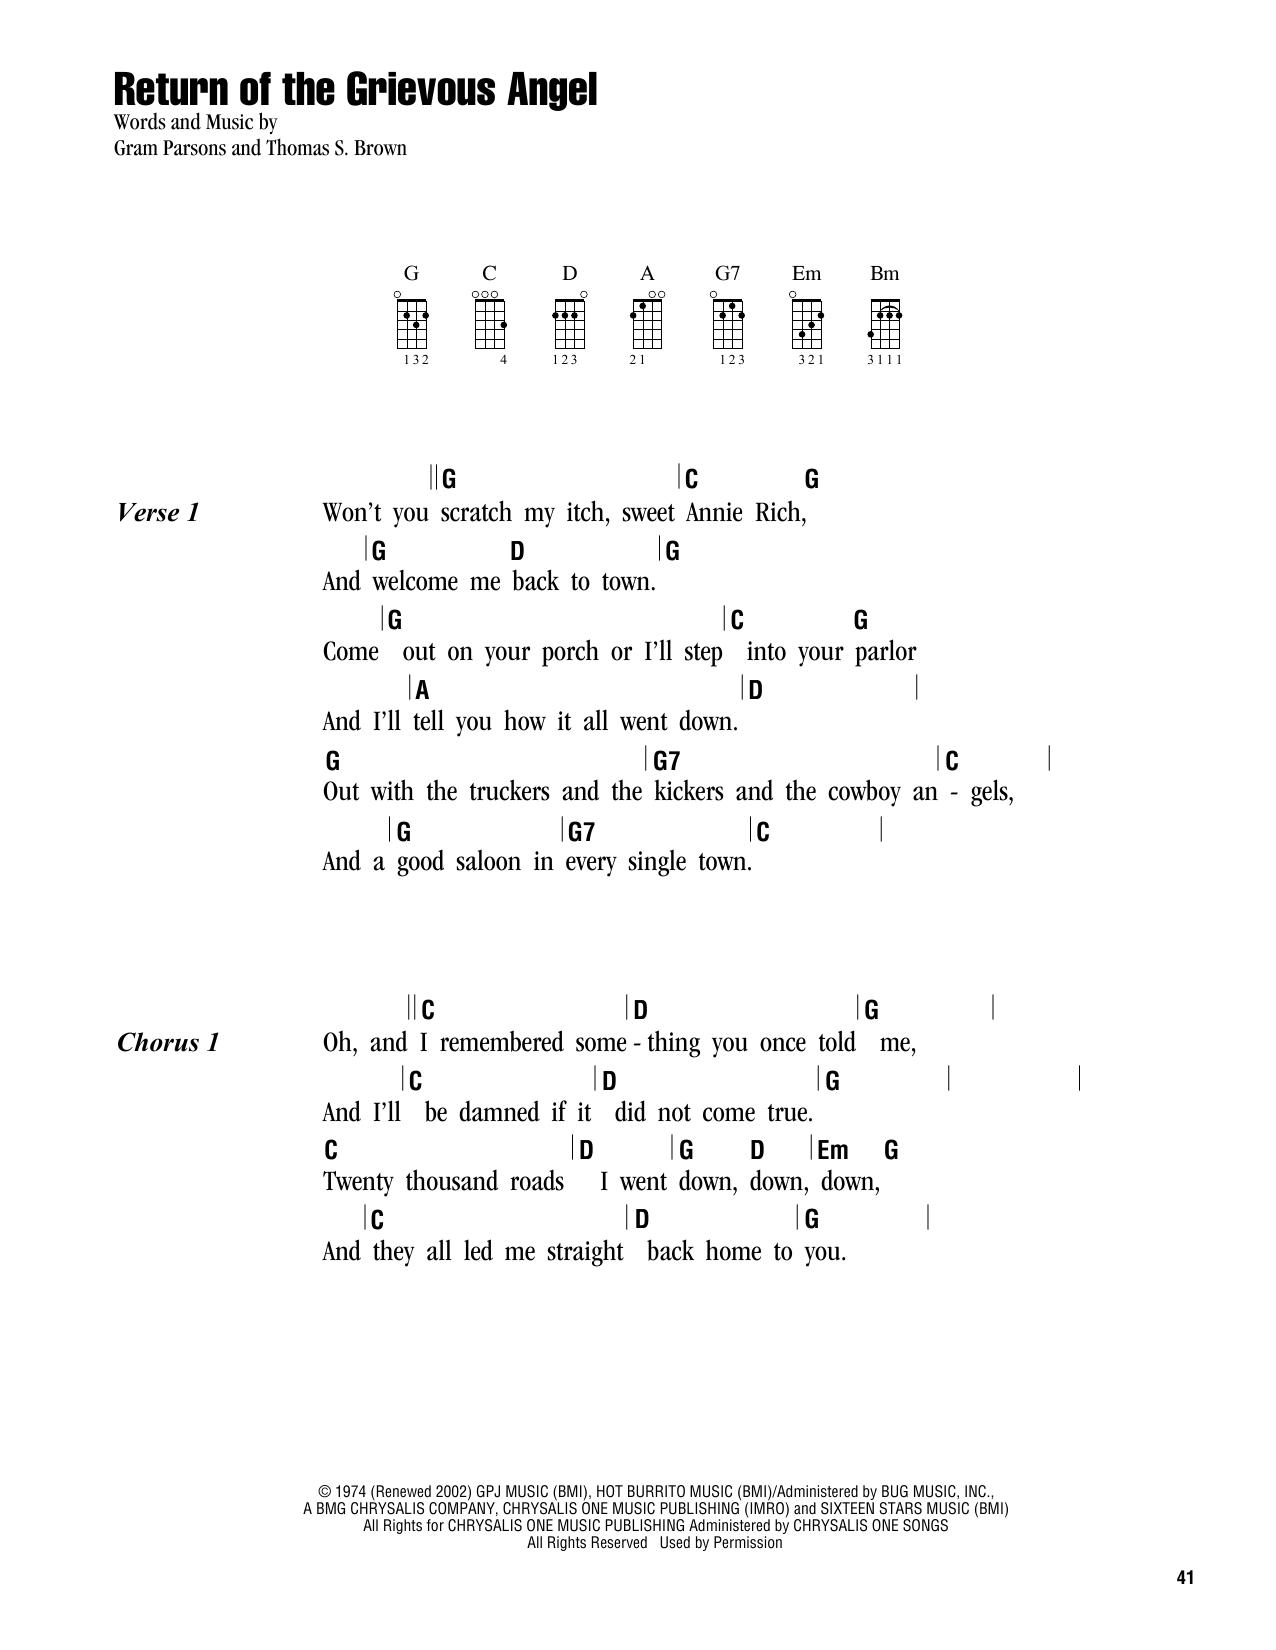 Tablature guitare Return Of The Grievous Angel de Gram Parsons - Ukulele (strumming patterns)